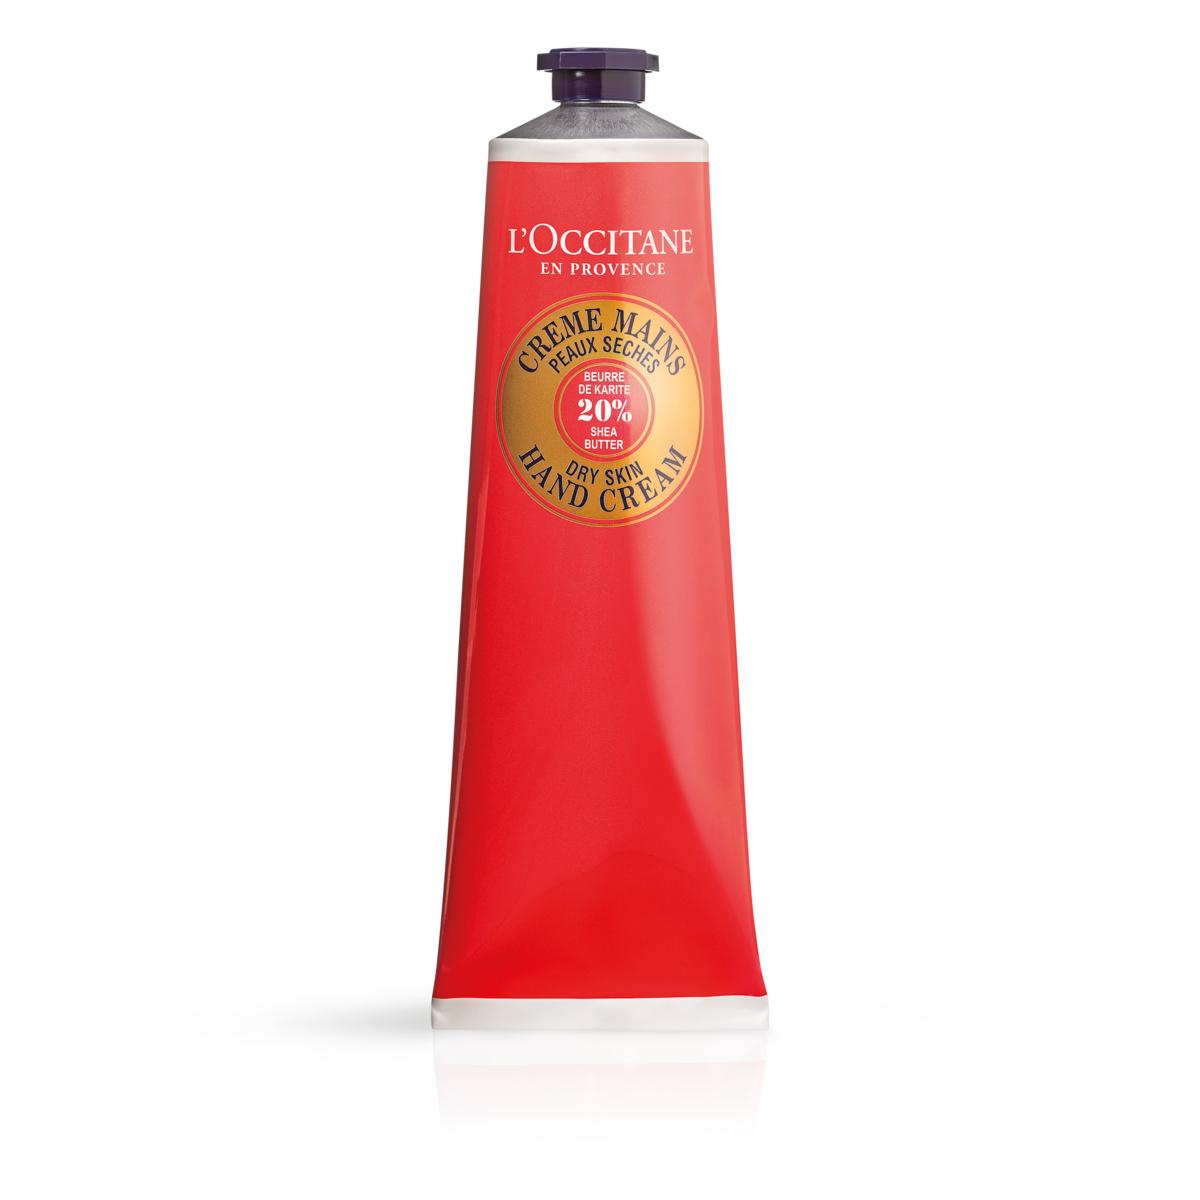 Crema mani al karité di L'Occitane